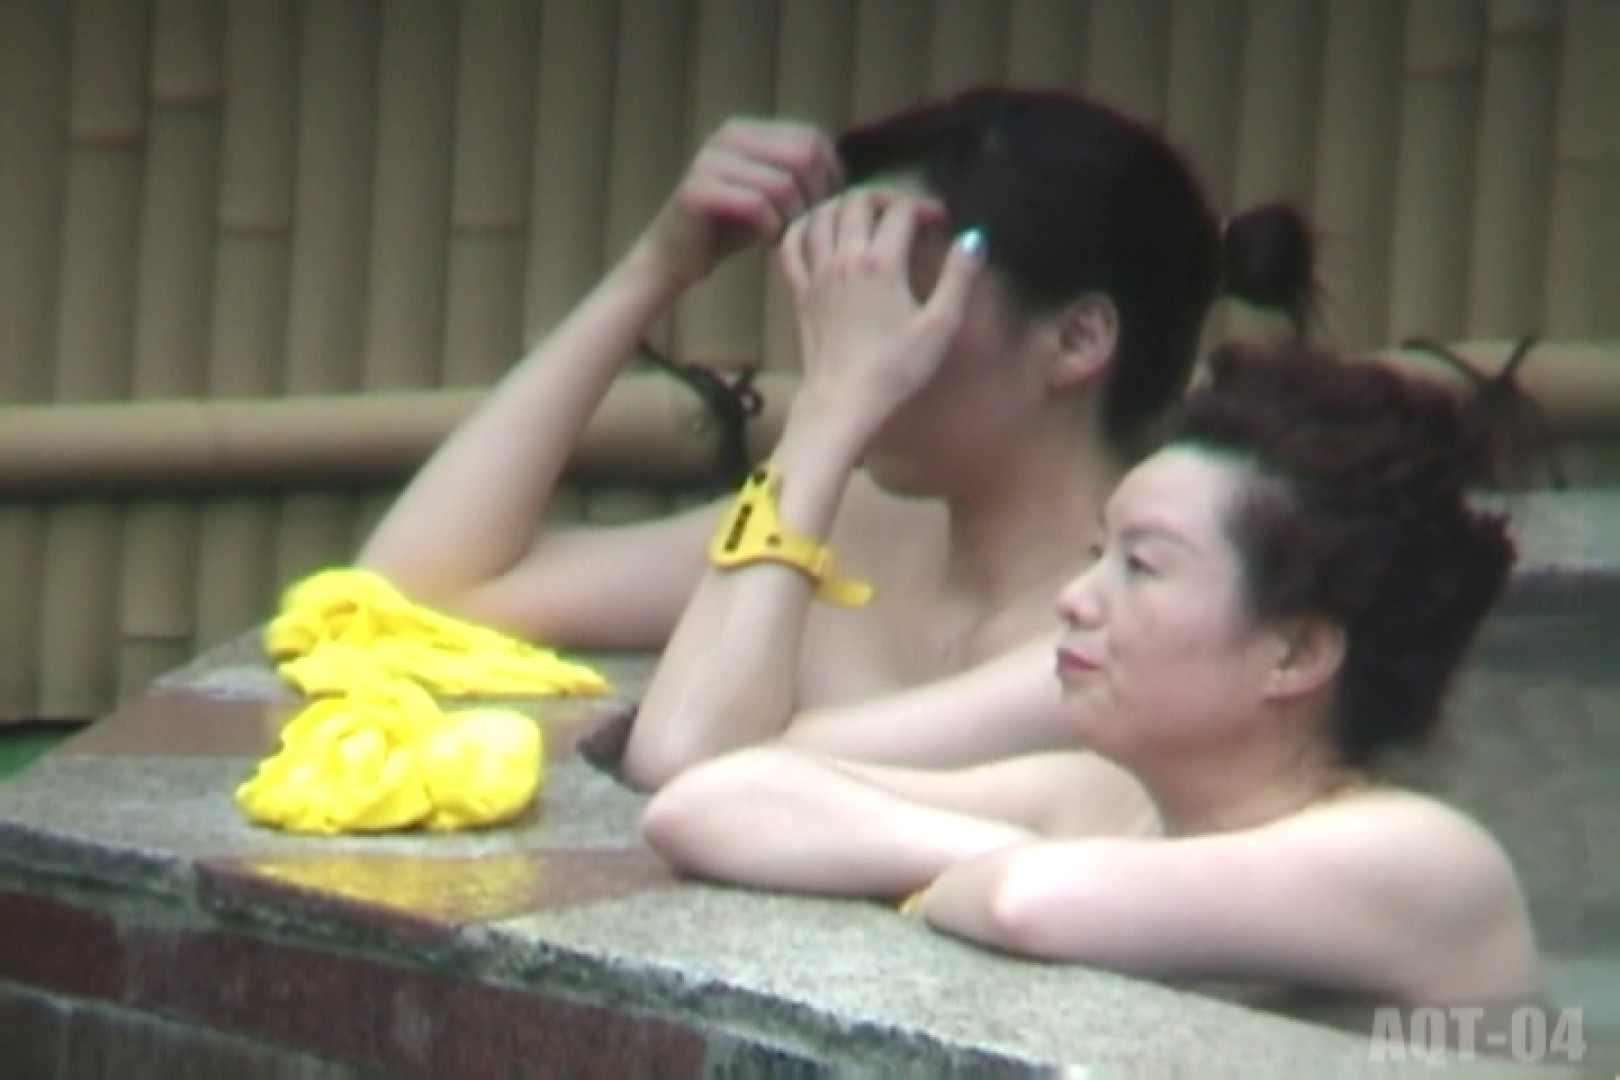 Aquaな露天風呂Vol.743 盗撮師作品 オマンコ無修正動画無料 91pic 77